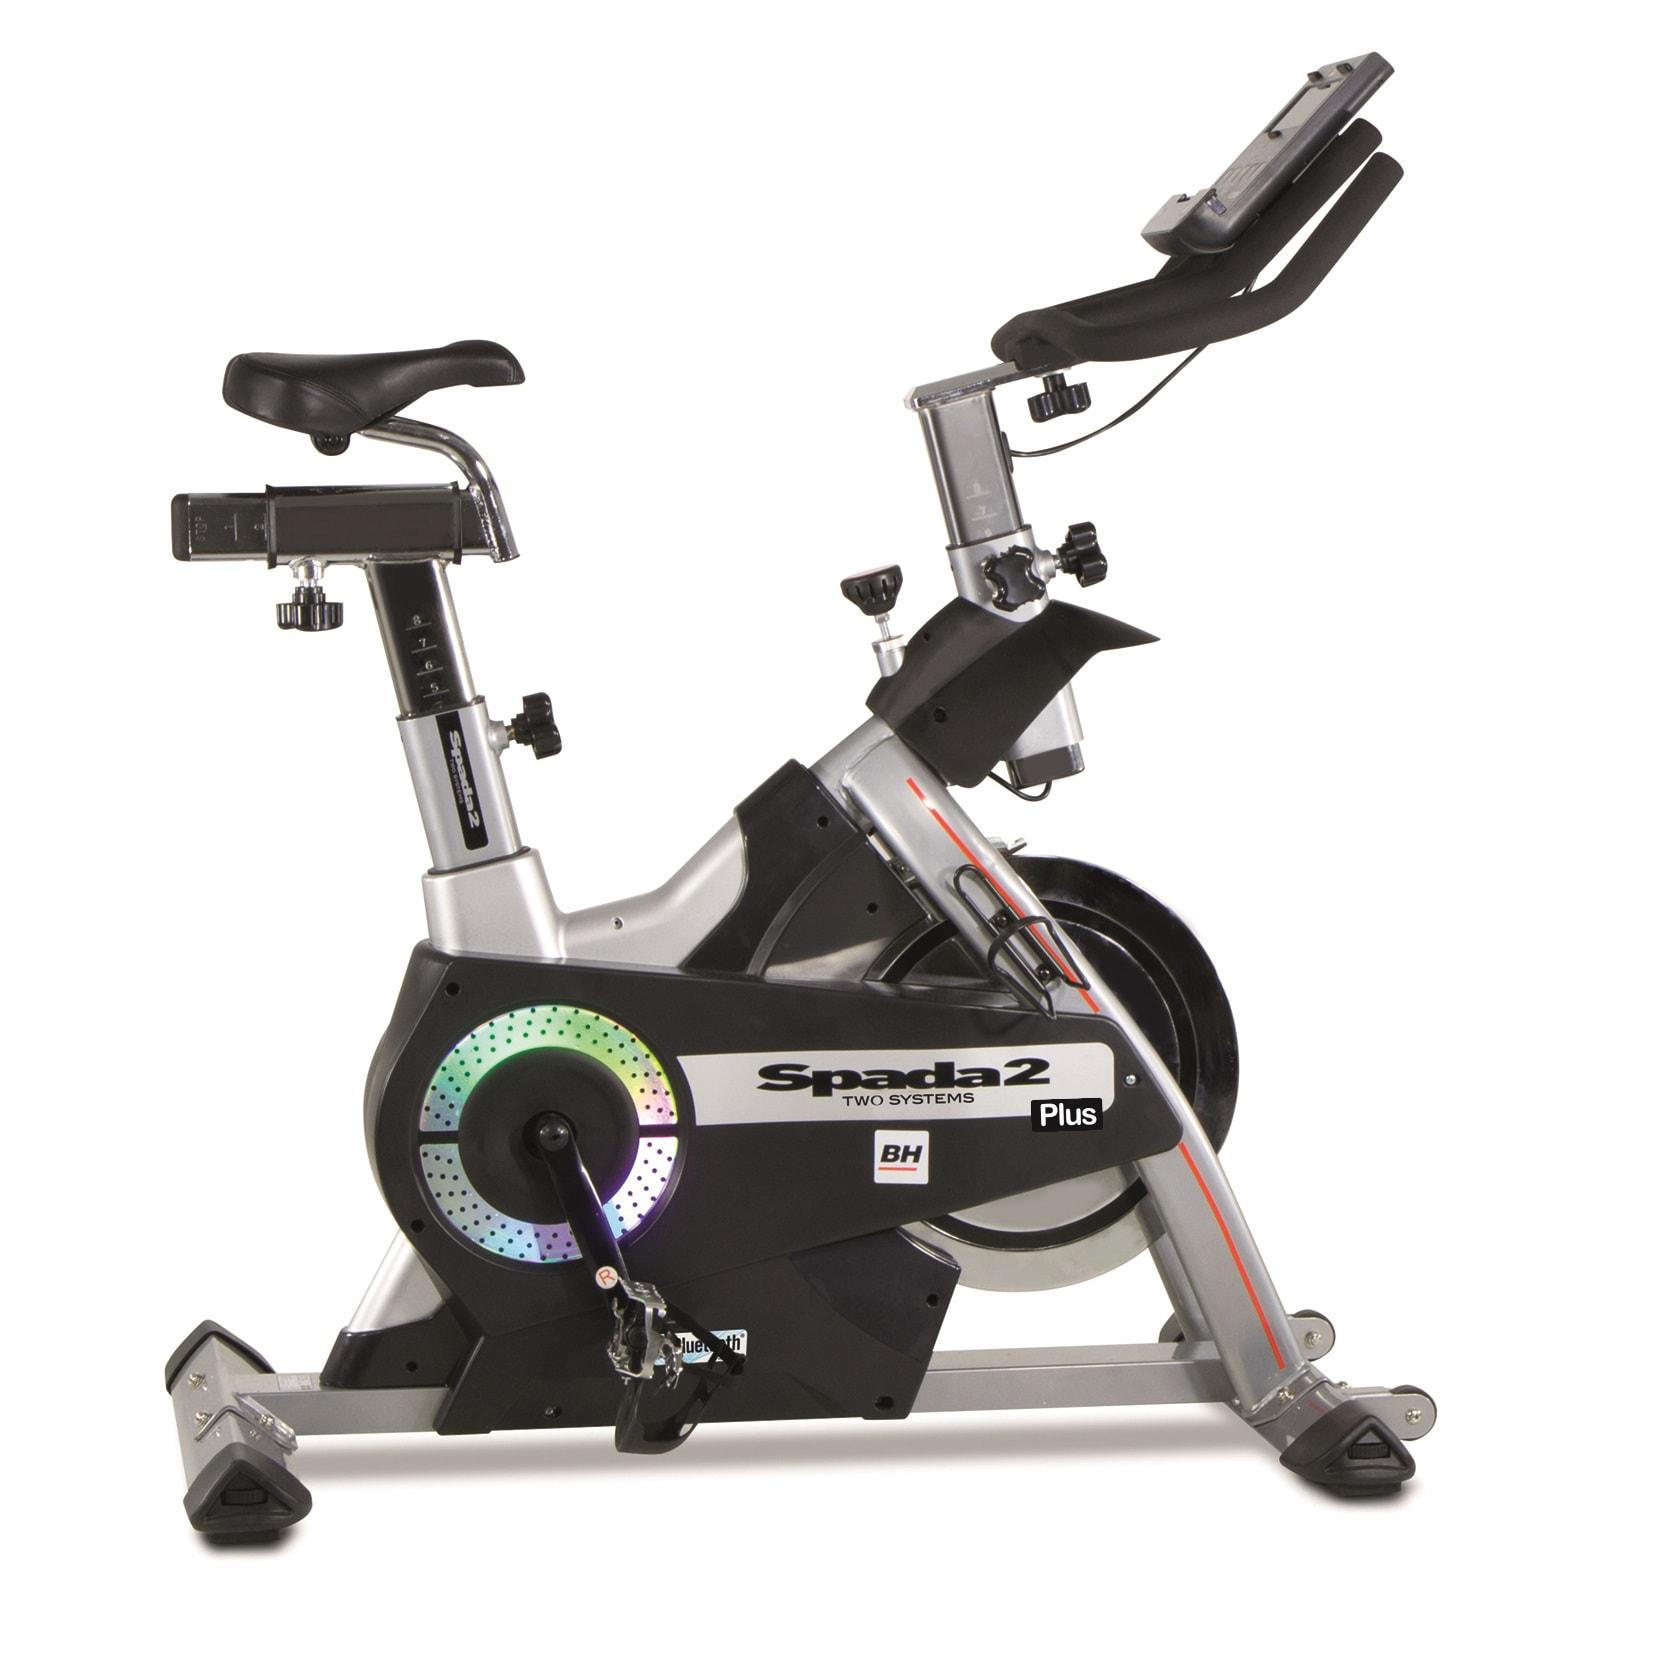 Bh fitness I.SPADA II PLUS